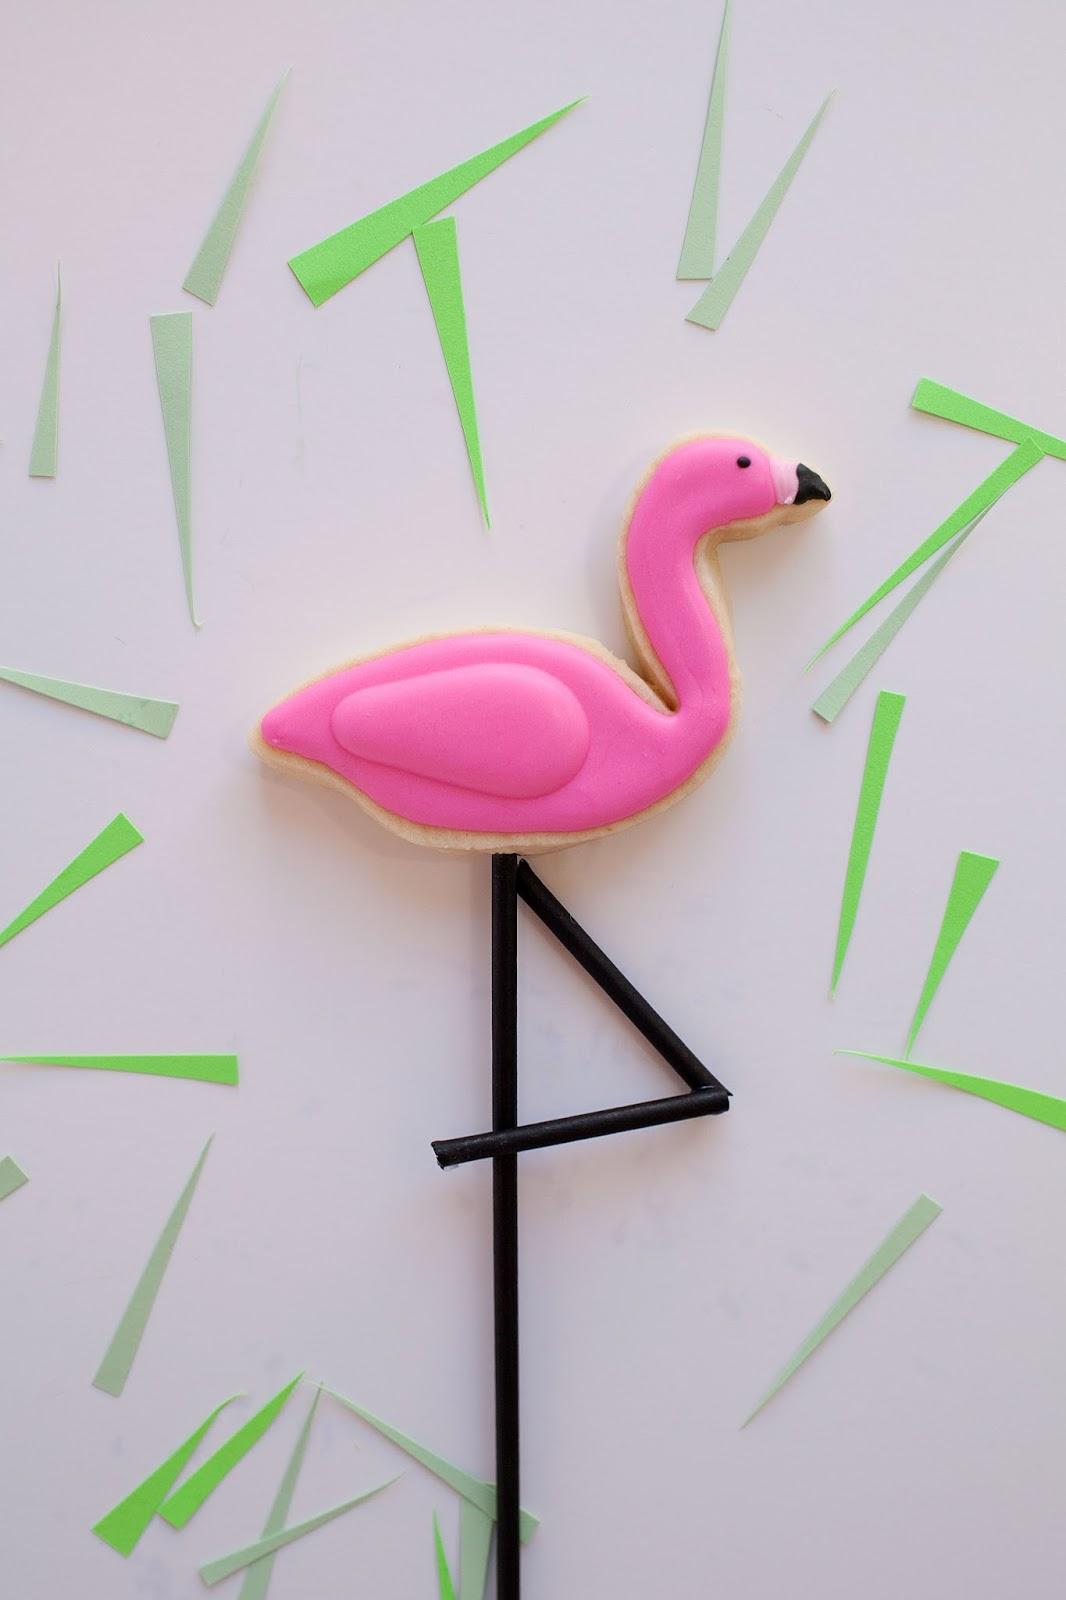 lawn flamingo outline - photo #39